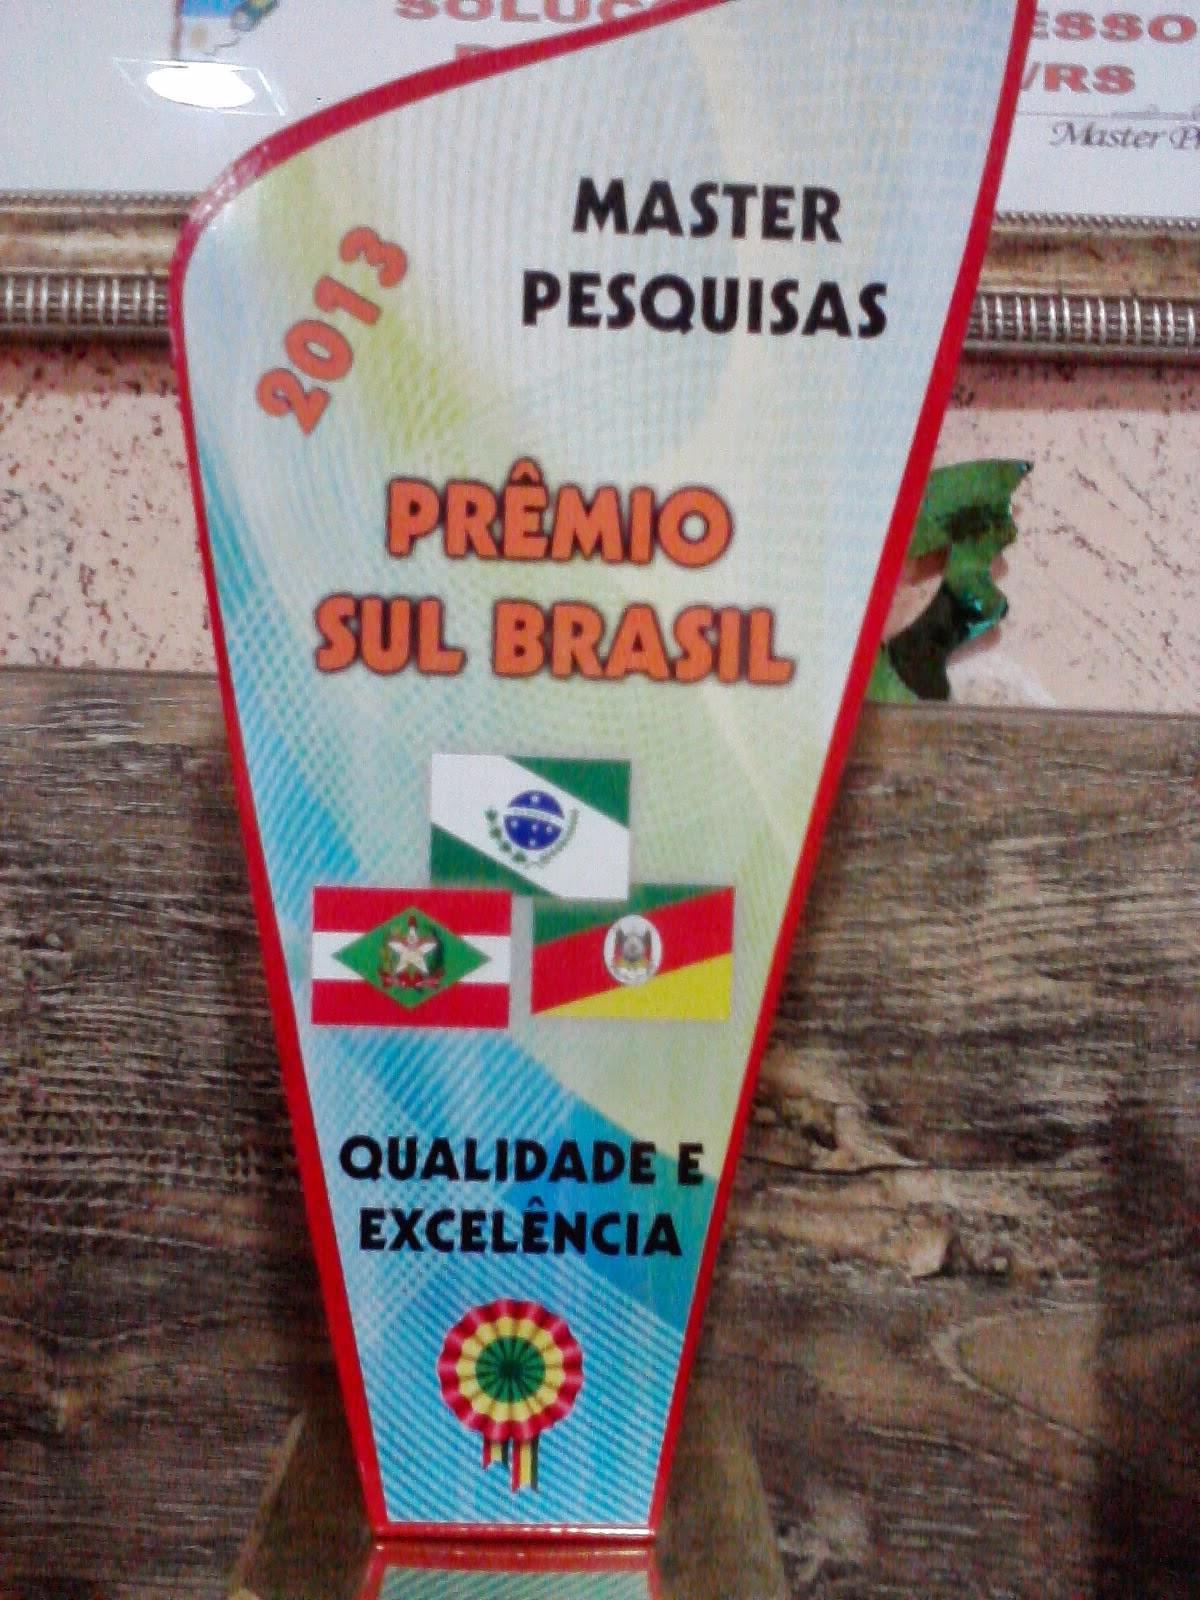 Prêmio Sul Brasil 2013